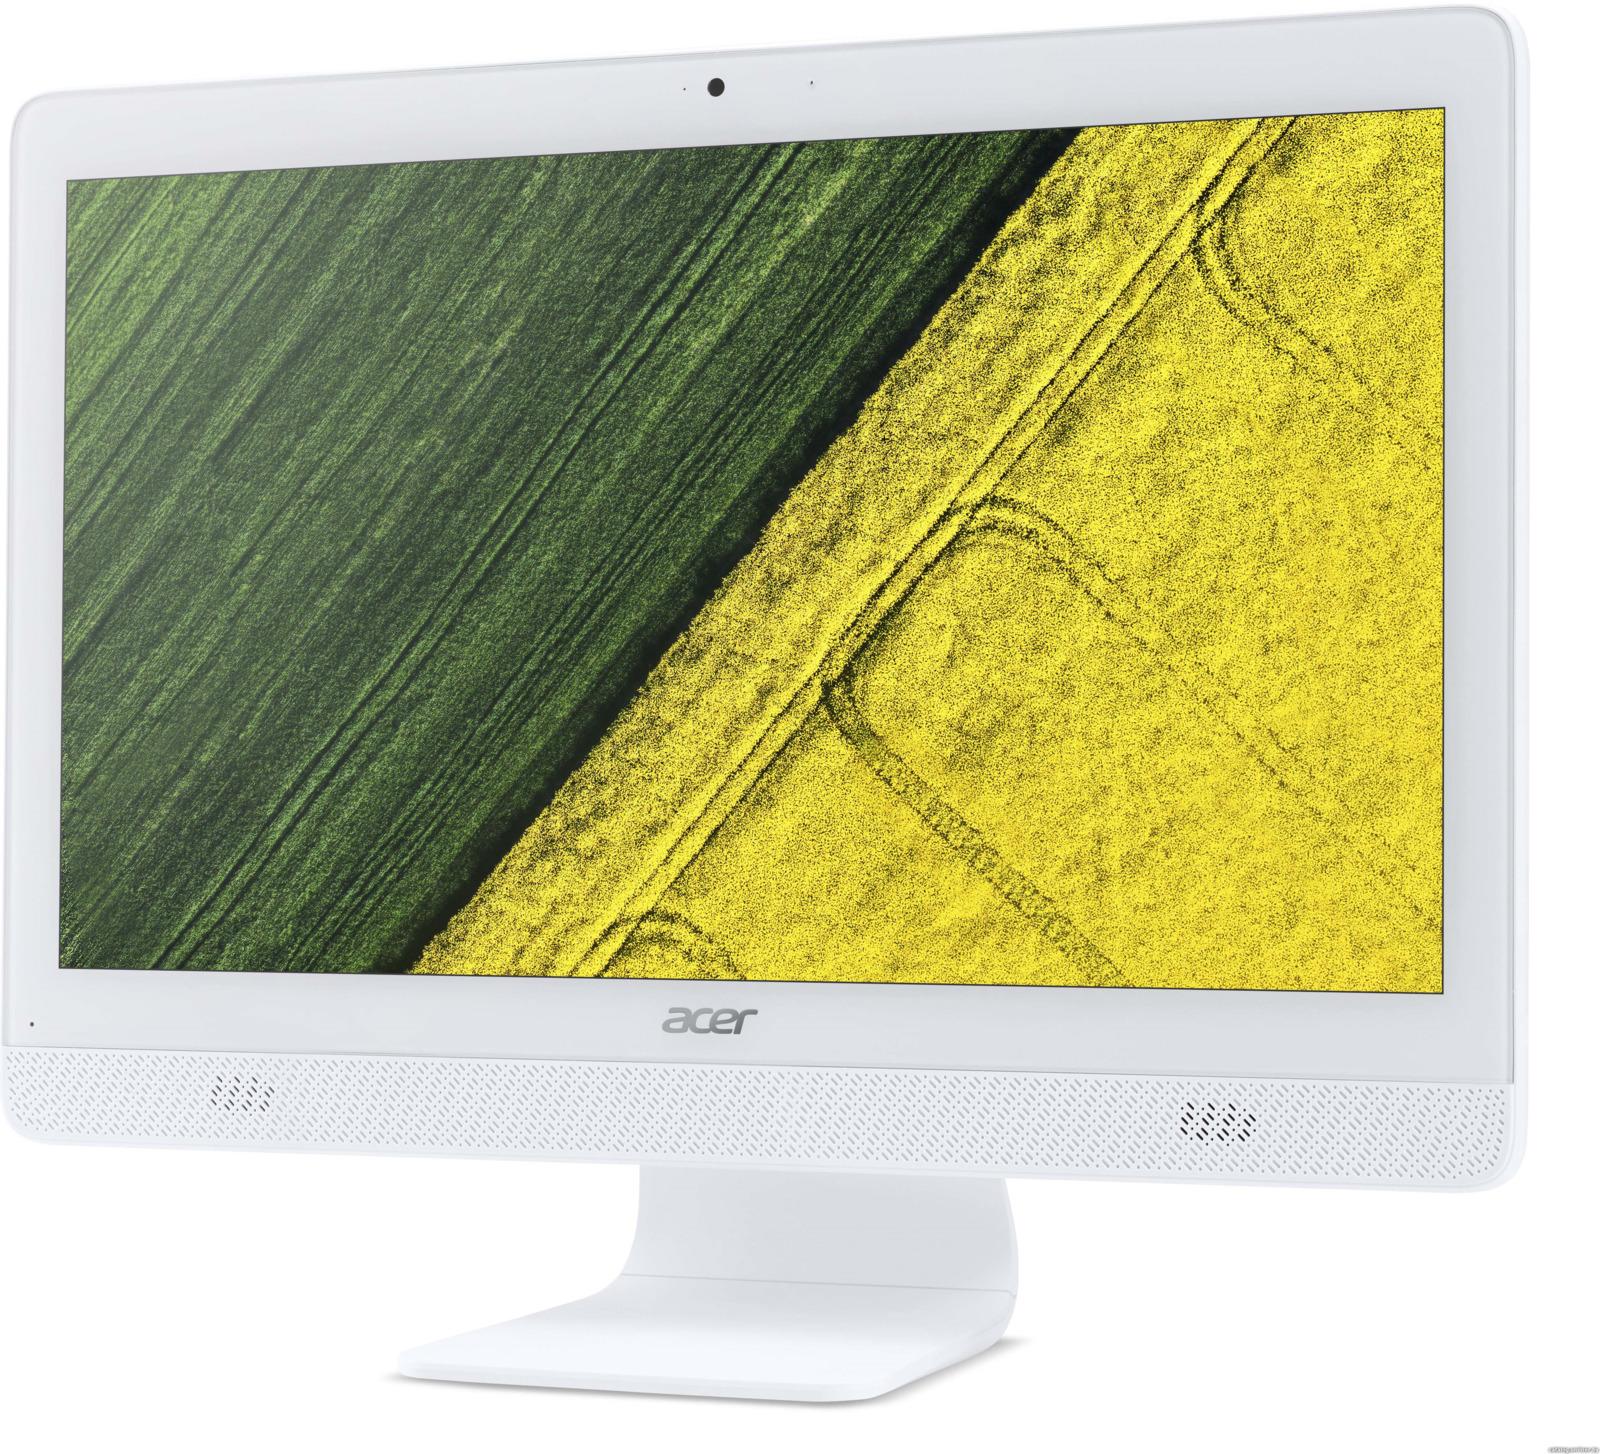 Моноблок Acer Aspire C20-820, DQ.BC6ER.006, 19.5